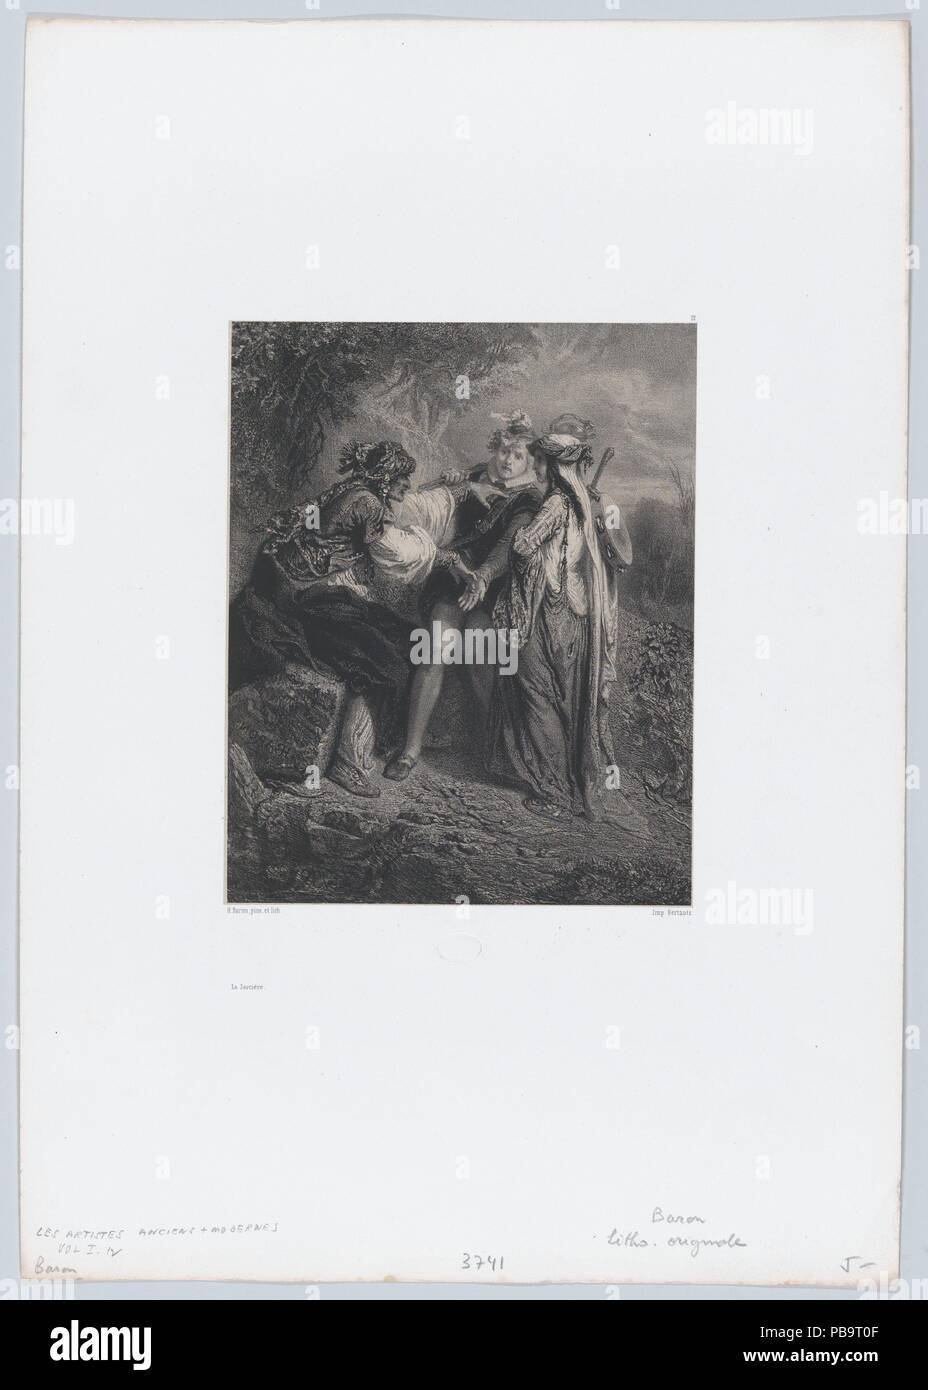 The Witch. Artist: Henri-Charles-Antoine Baron (French, Besançon 1816-1885 Geneva). Dimensions: Sheet: 17 5/8 × 12 5/16 in. (44.8 × 31.3 cm)  Image: 8 1/8 × 6 1/2 in. (20.7 × 16.5 cm). Printer: Bertauts. Series/Portfolio: Les Artistes Anciens et Modernes. Date: 1850. Museum: Metropolitan Museum of Art, New York, USA. - Stock Image